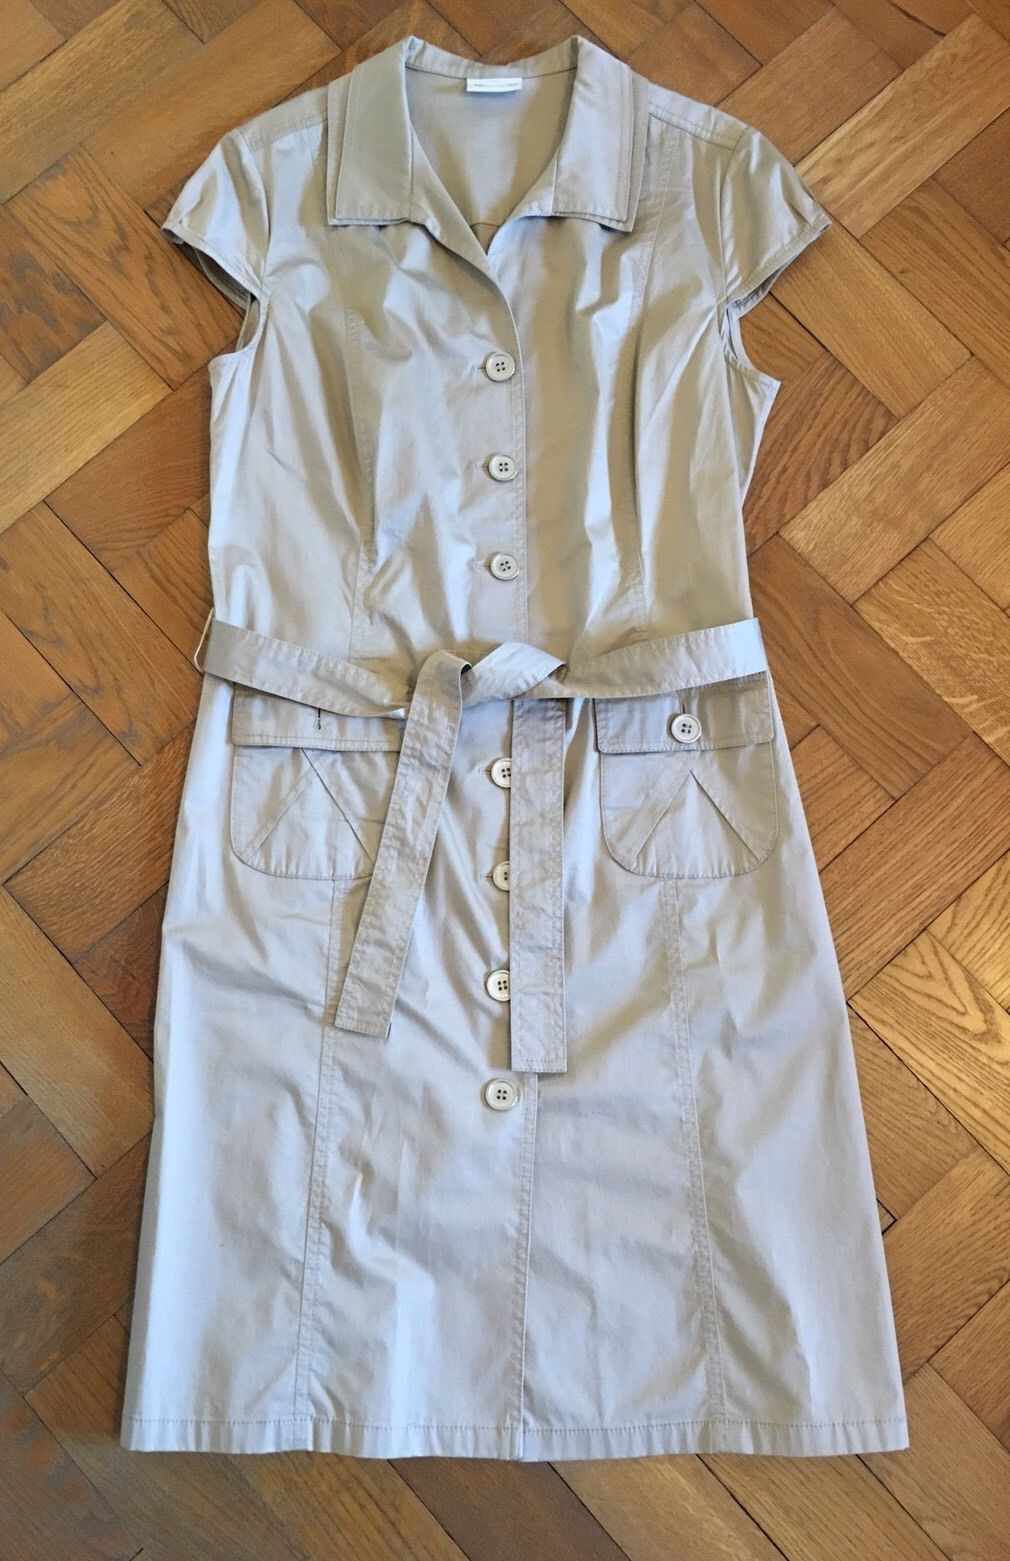 Frank Walder Kleid 10 L beige Hemdblusenkleid 10 10 M XL  eBay